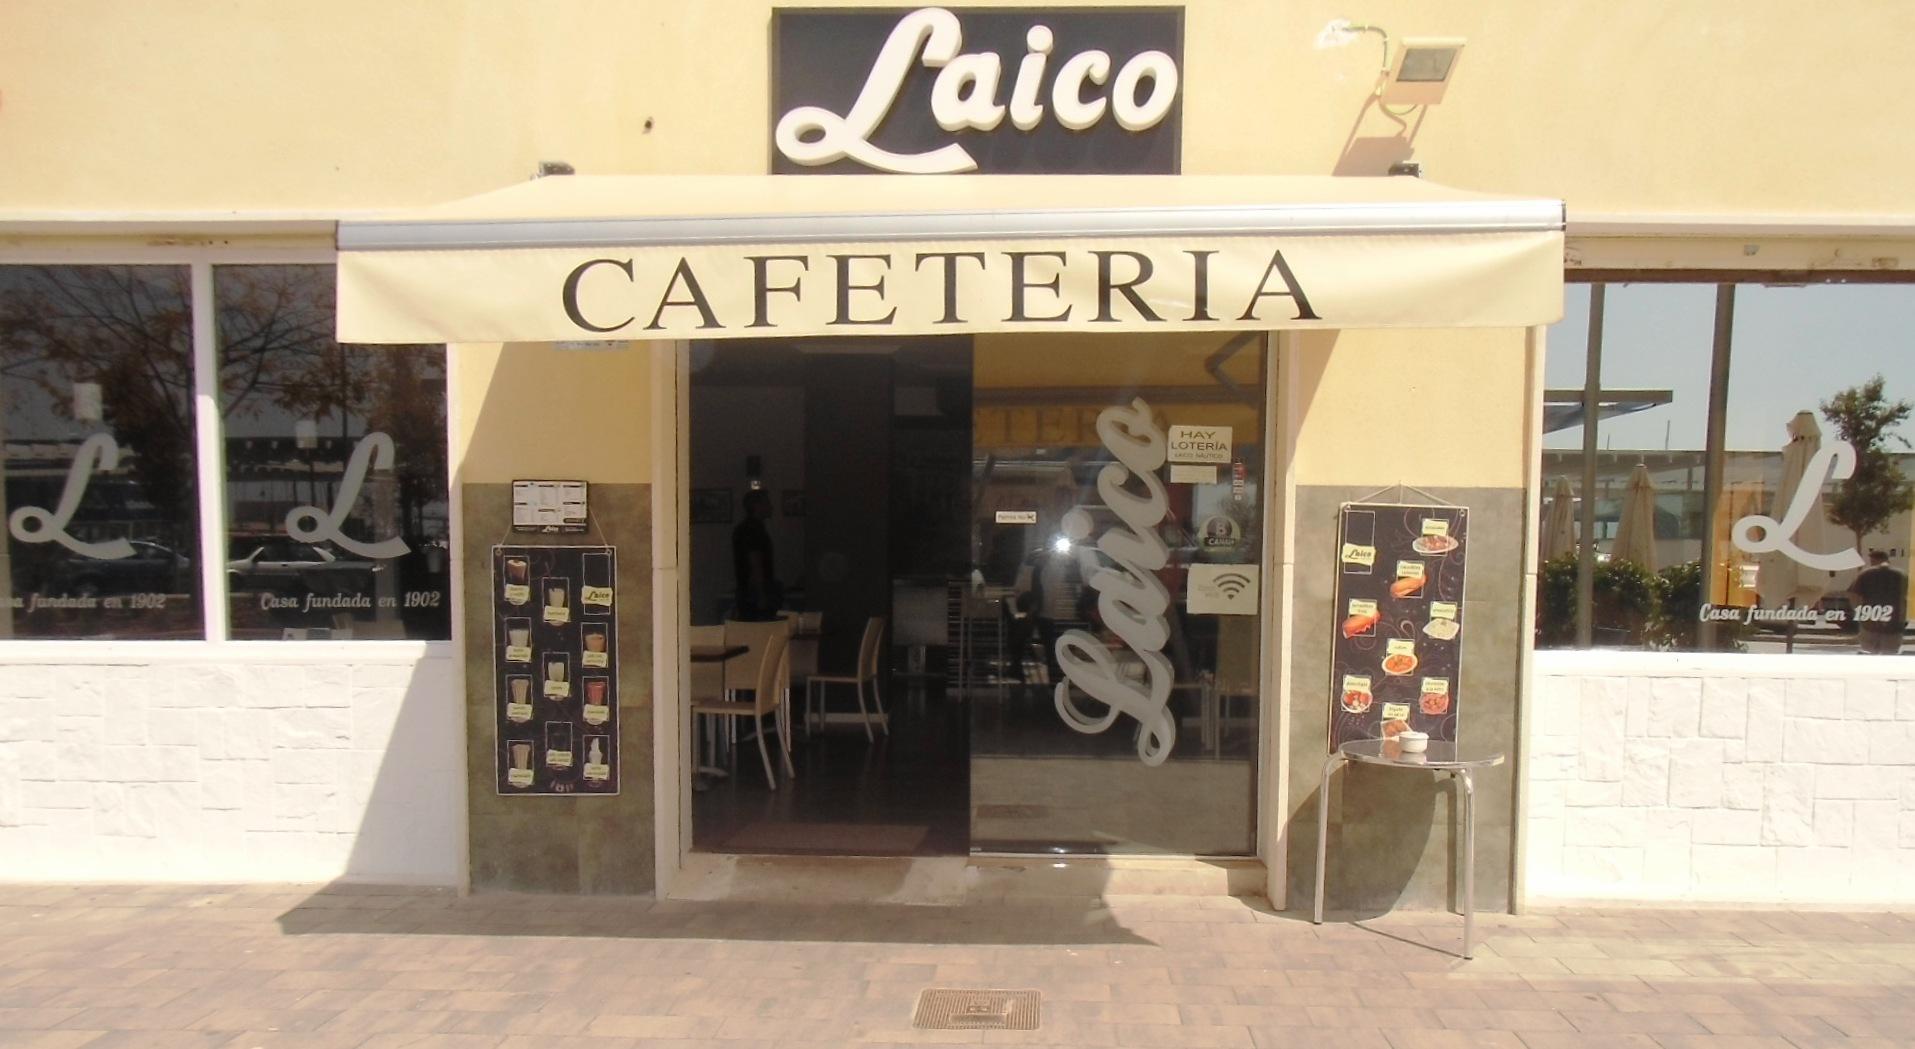 CAFETERIA LAICO